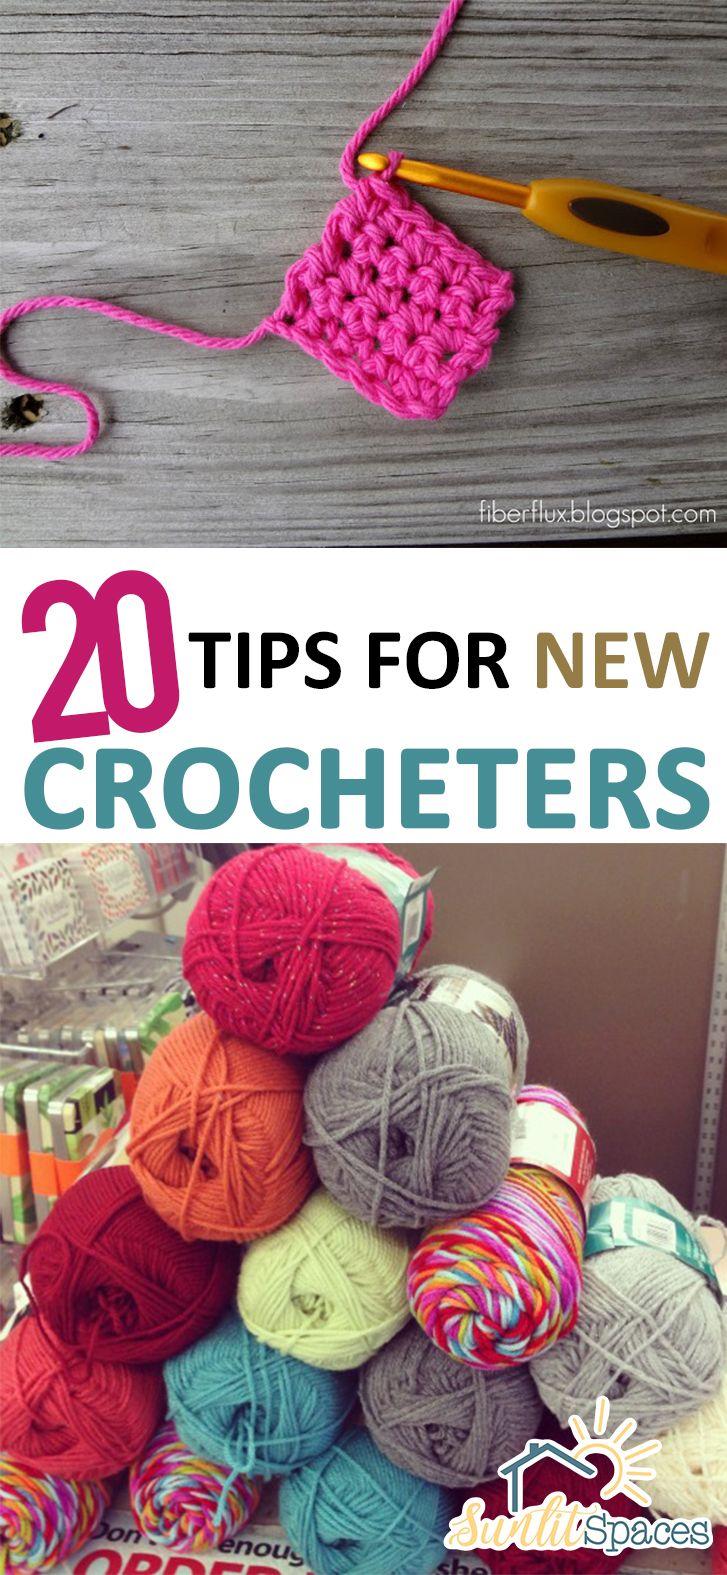 20 tips for new crocheters popular pins crochet and learning 20 tips for new crocheters easy beginner crochet patternsloom knitting bankloansurffo Image collections